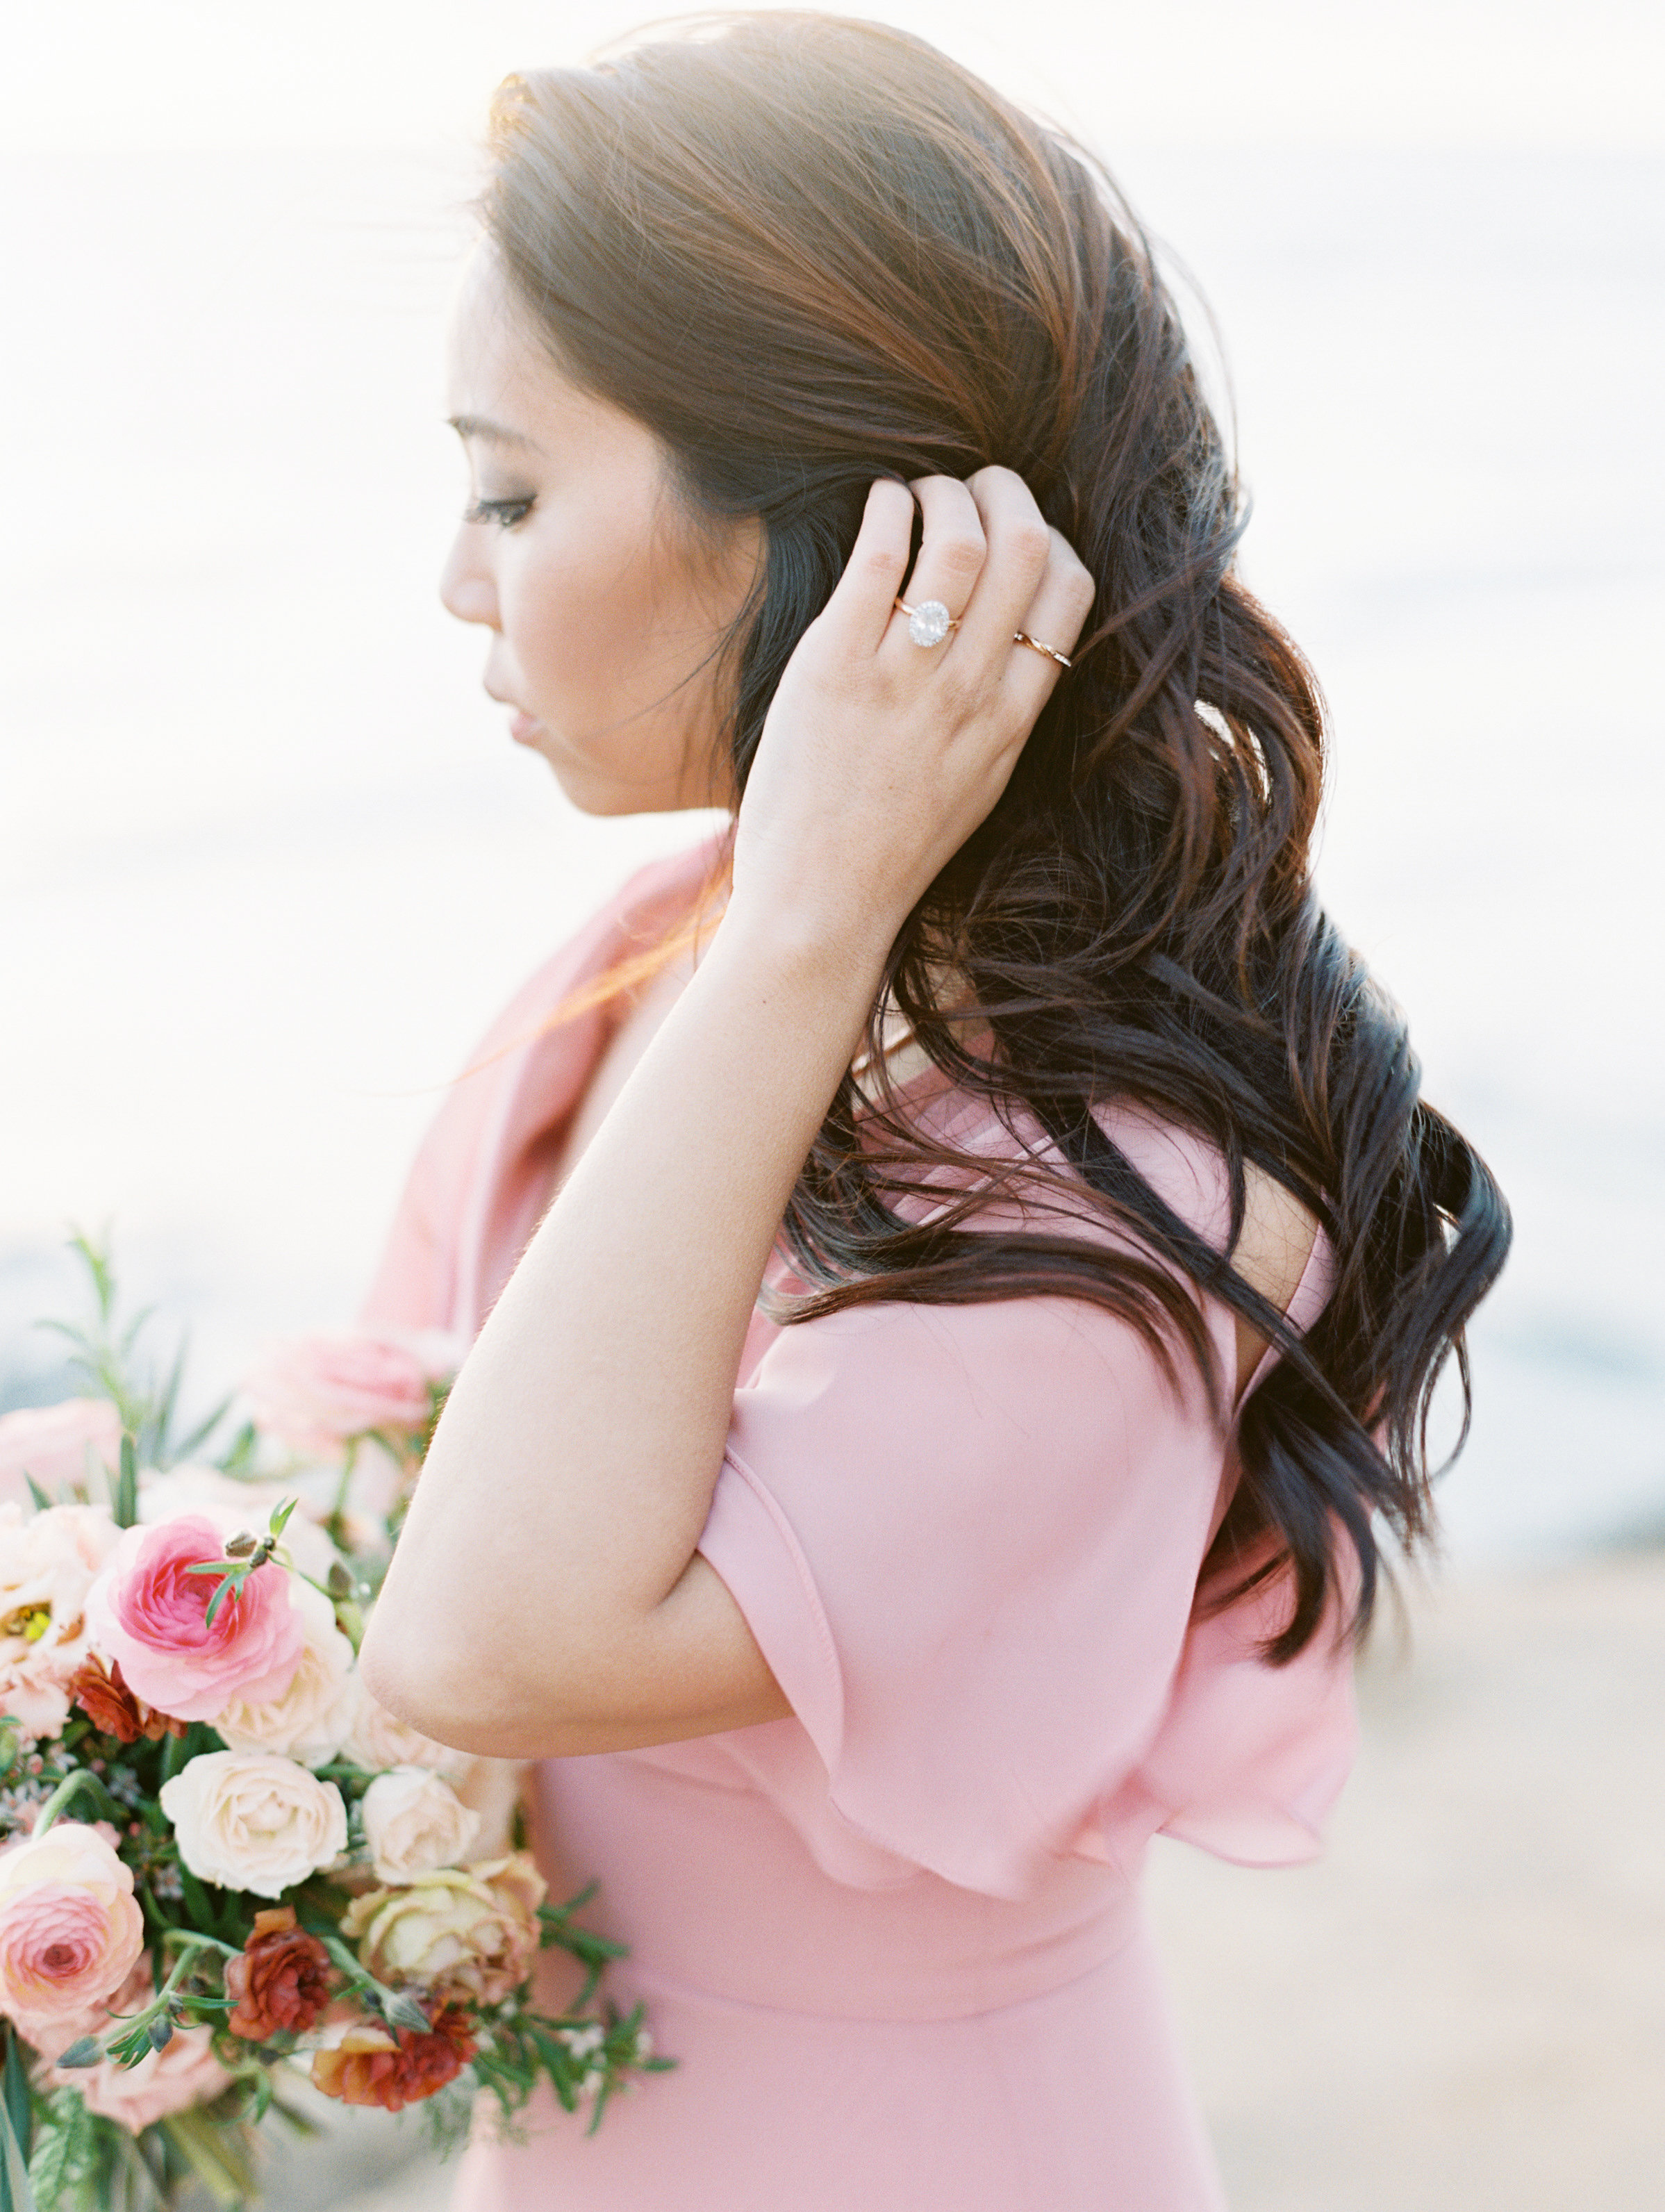 Photography  mallory dawn photo  / Hair and Makeup @  airpro_makeup  / Florals blue ladder botany / Dress @jennyyoonyc / Engagement Ring @  harrykazanjian /  Film Lab @goodmanfilmlab